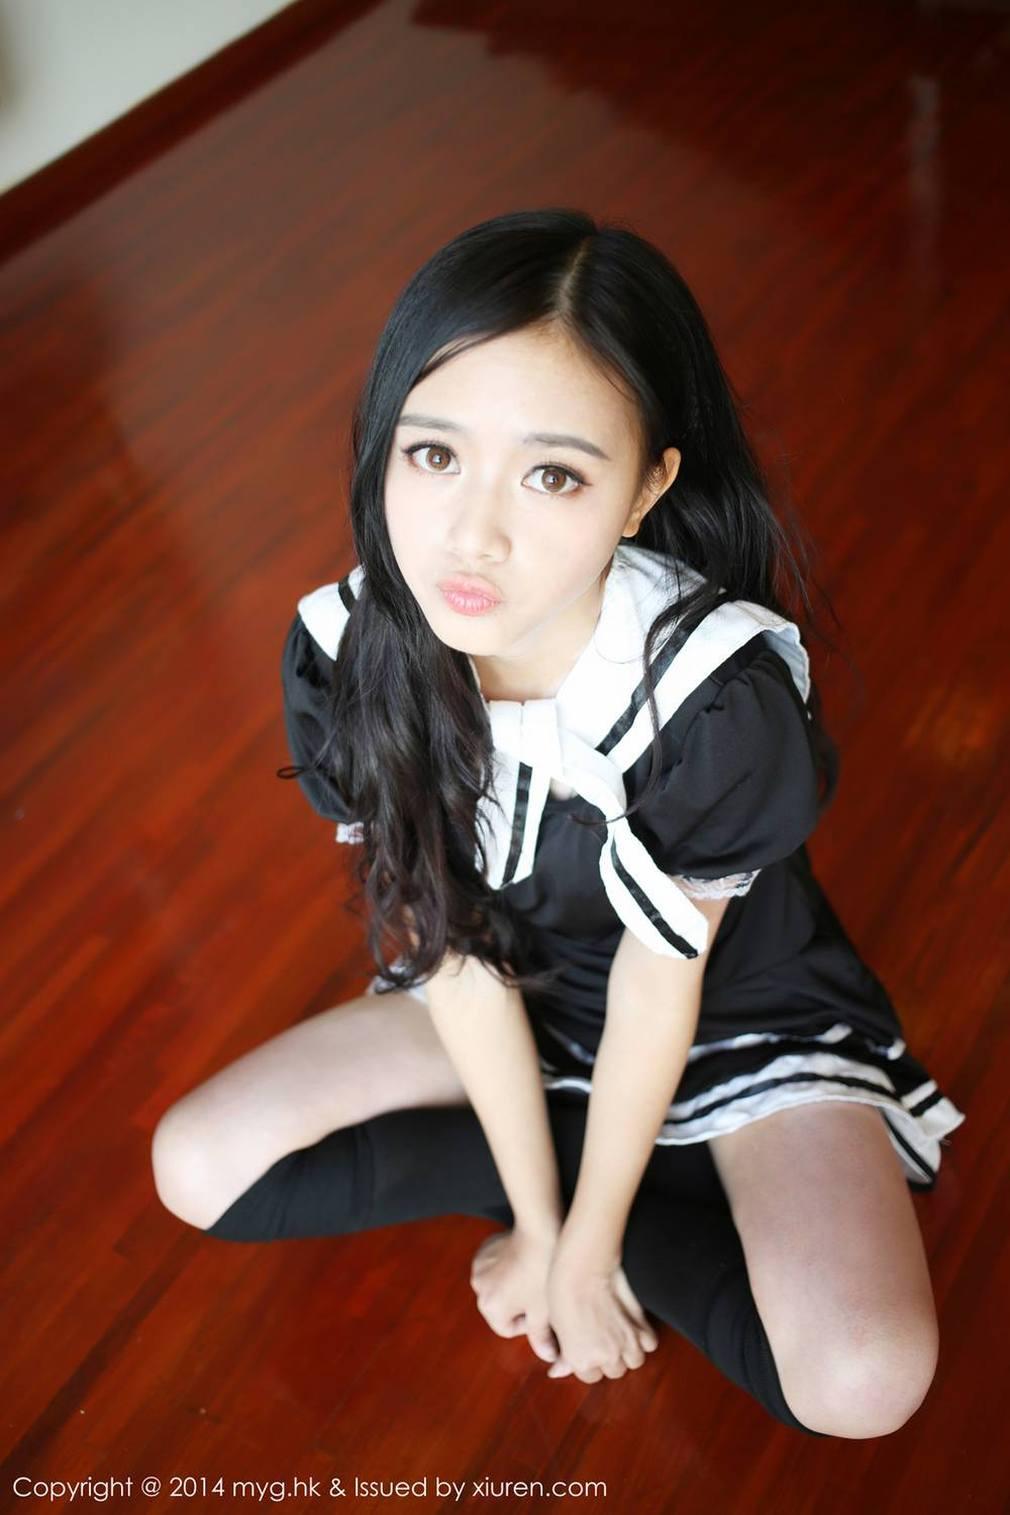 yu zhu toro nurse cosplayer bare butt mygirl